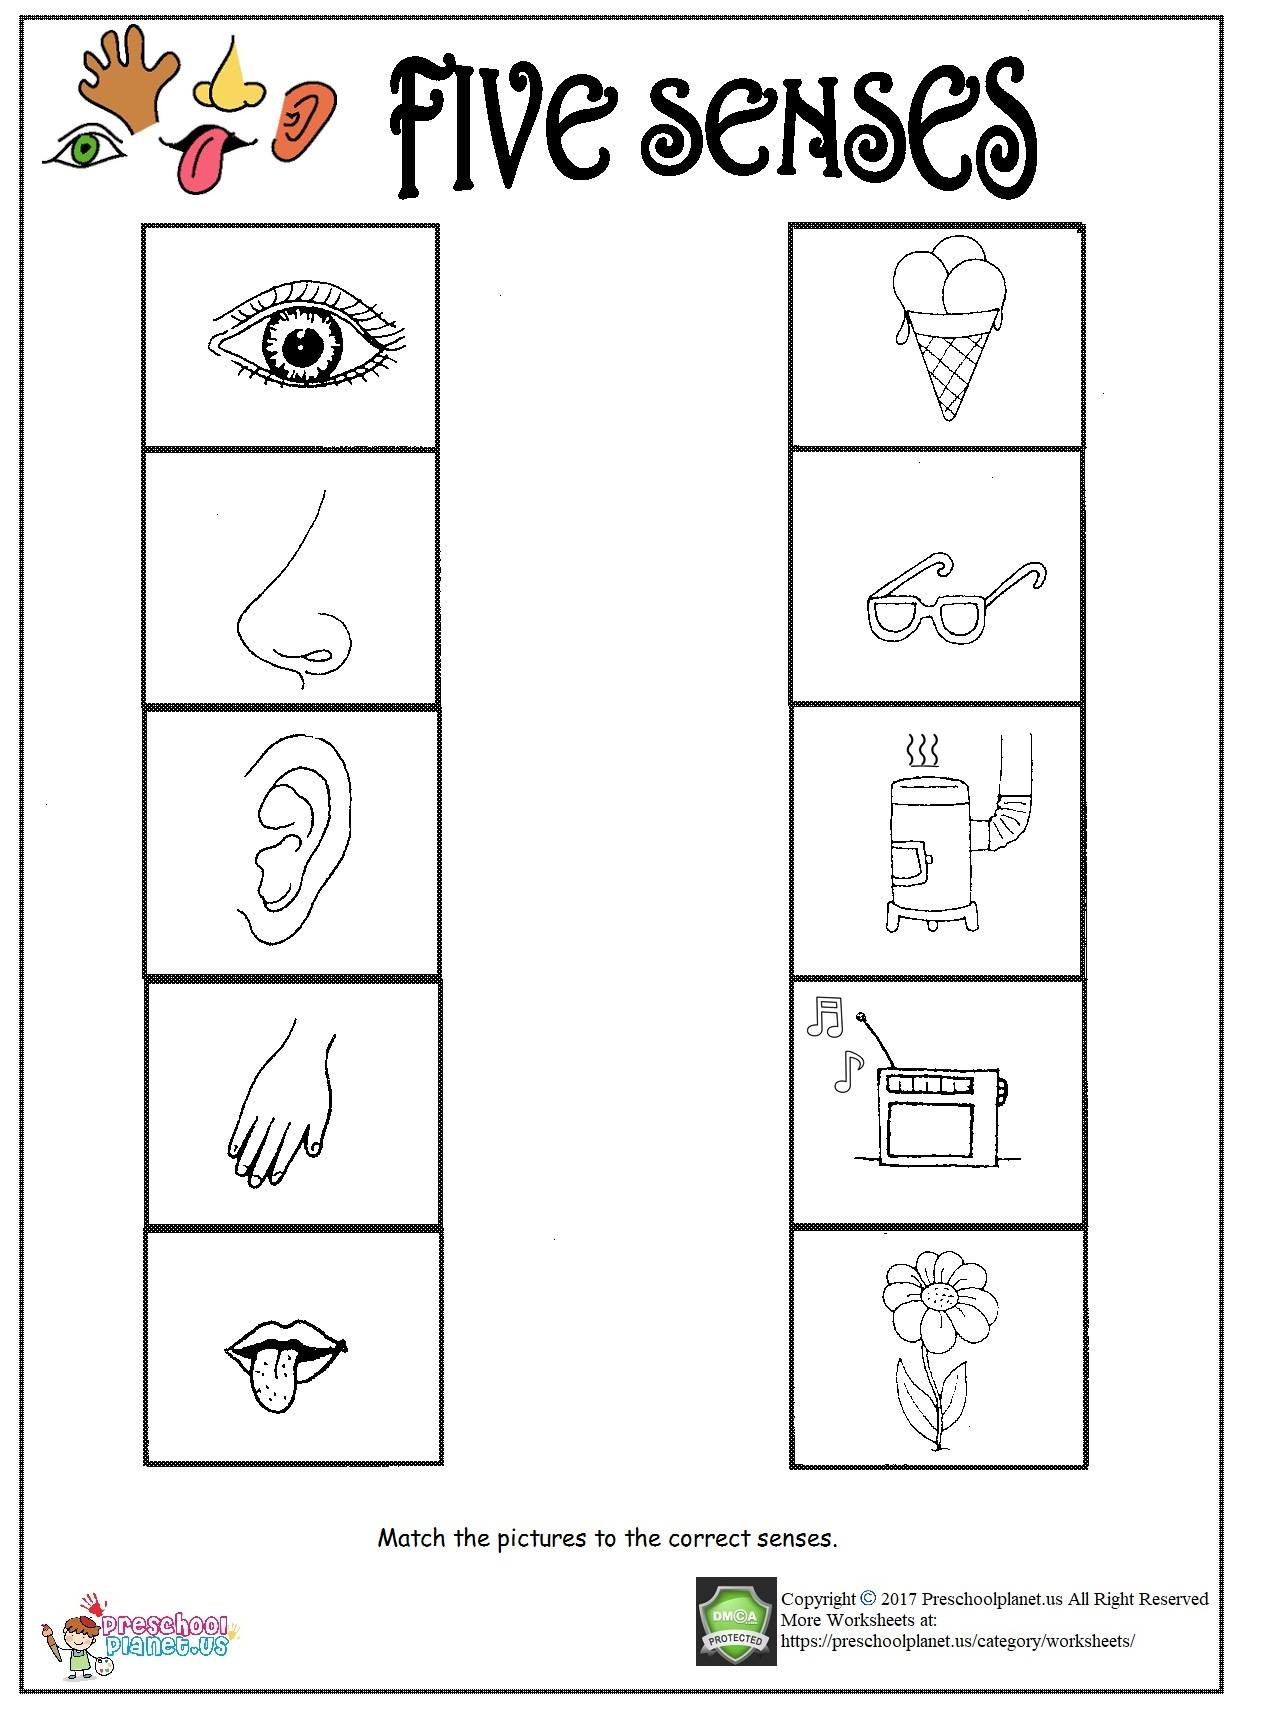 20 Five Senses Worksheets For Kindergarten